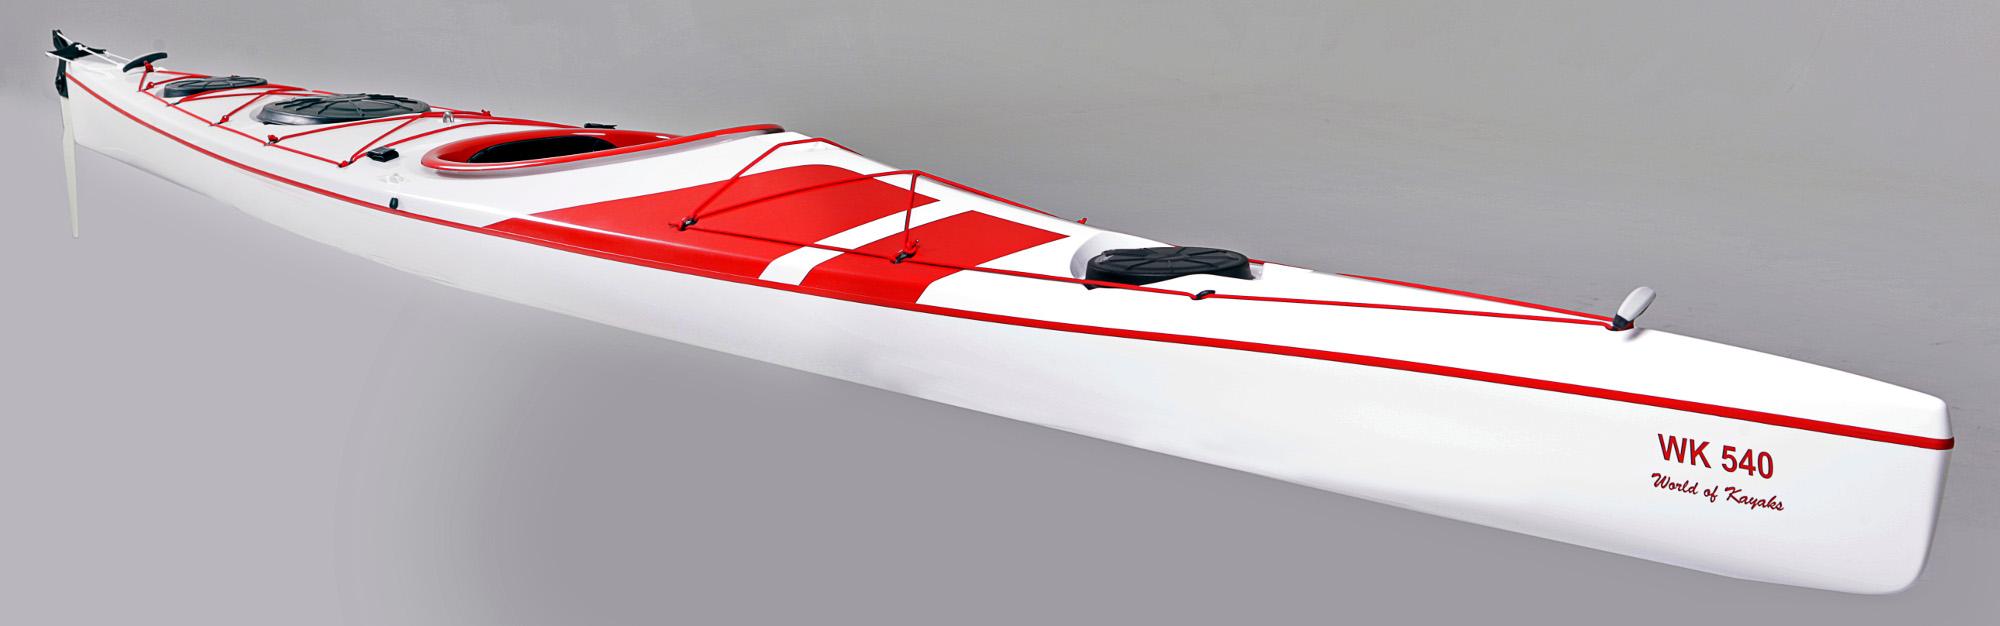 WK 540 Expedition - Spacious Expedition Kayak | World of Kayaks